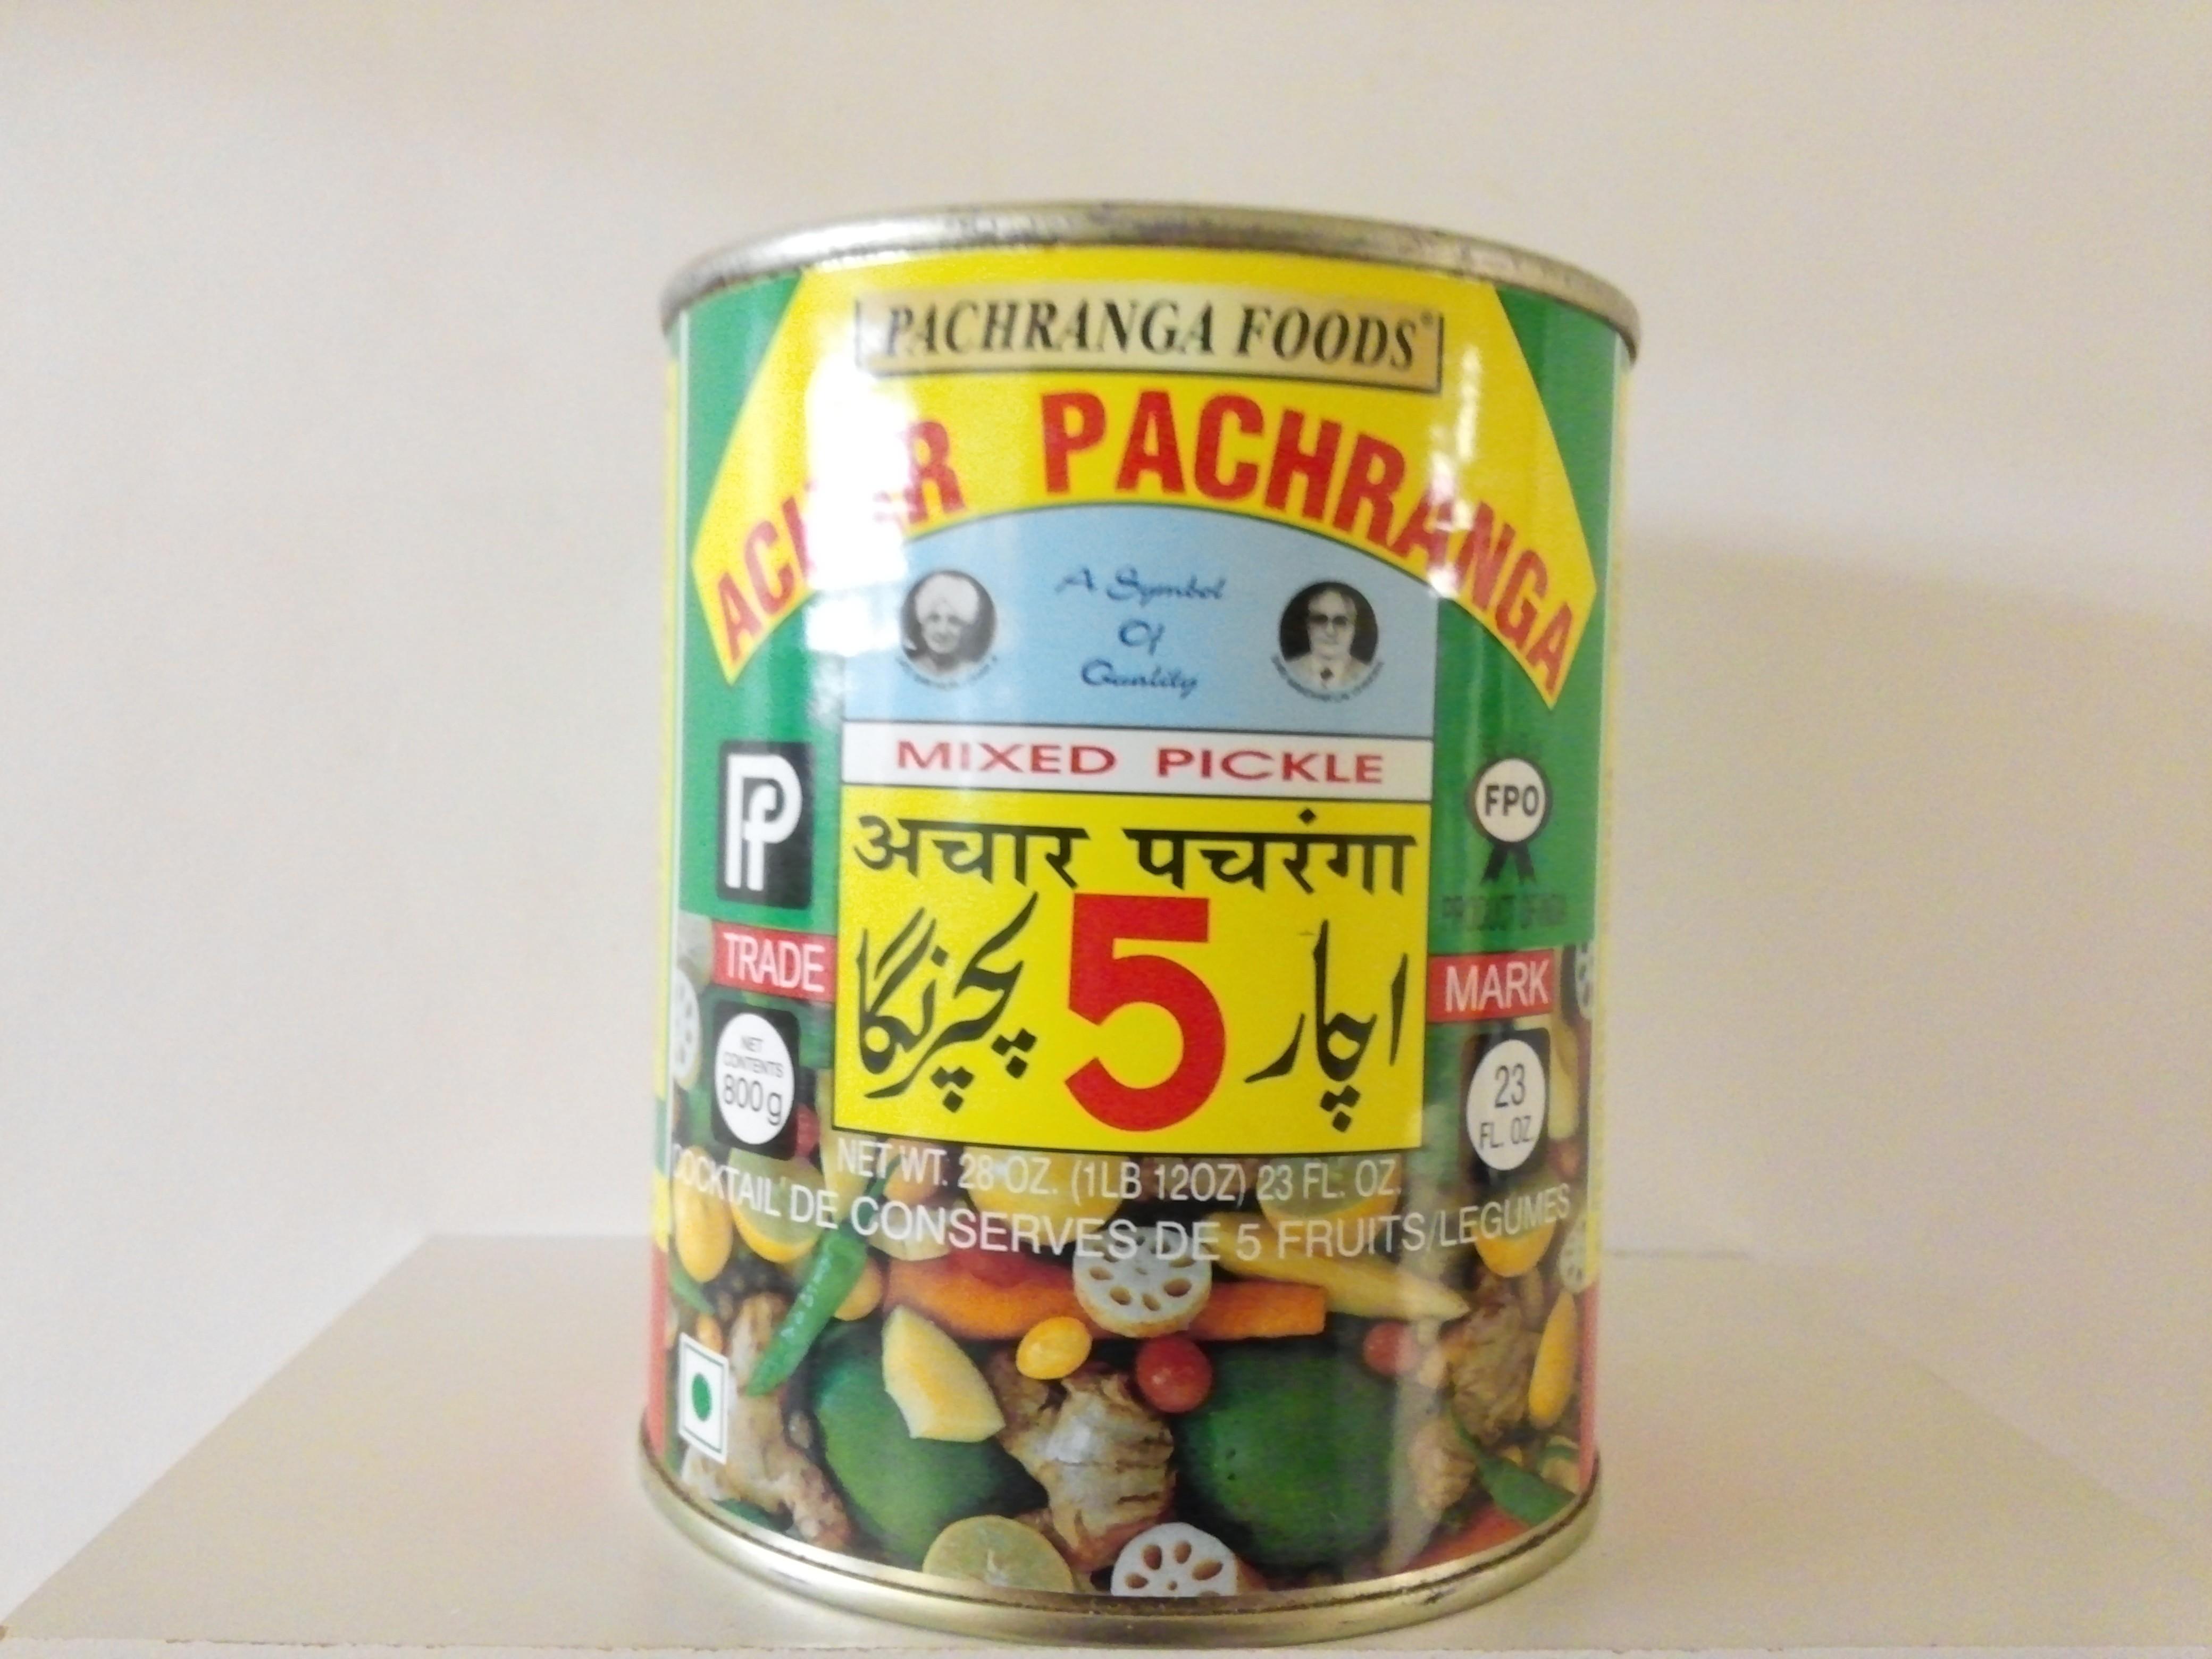 Pachranga Mixed Pickle 28 oz